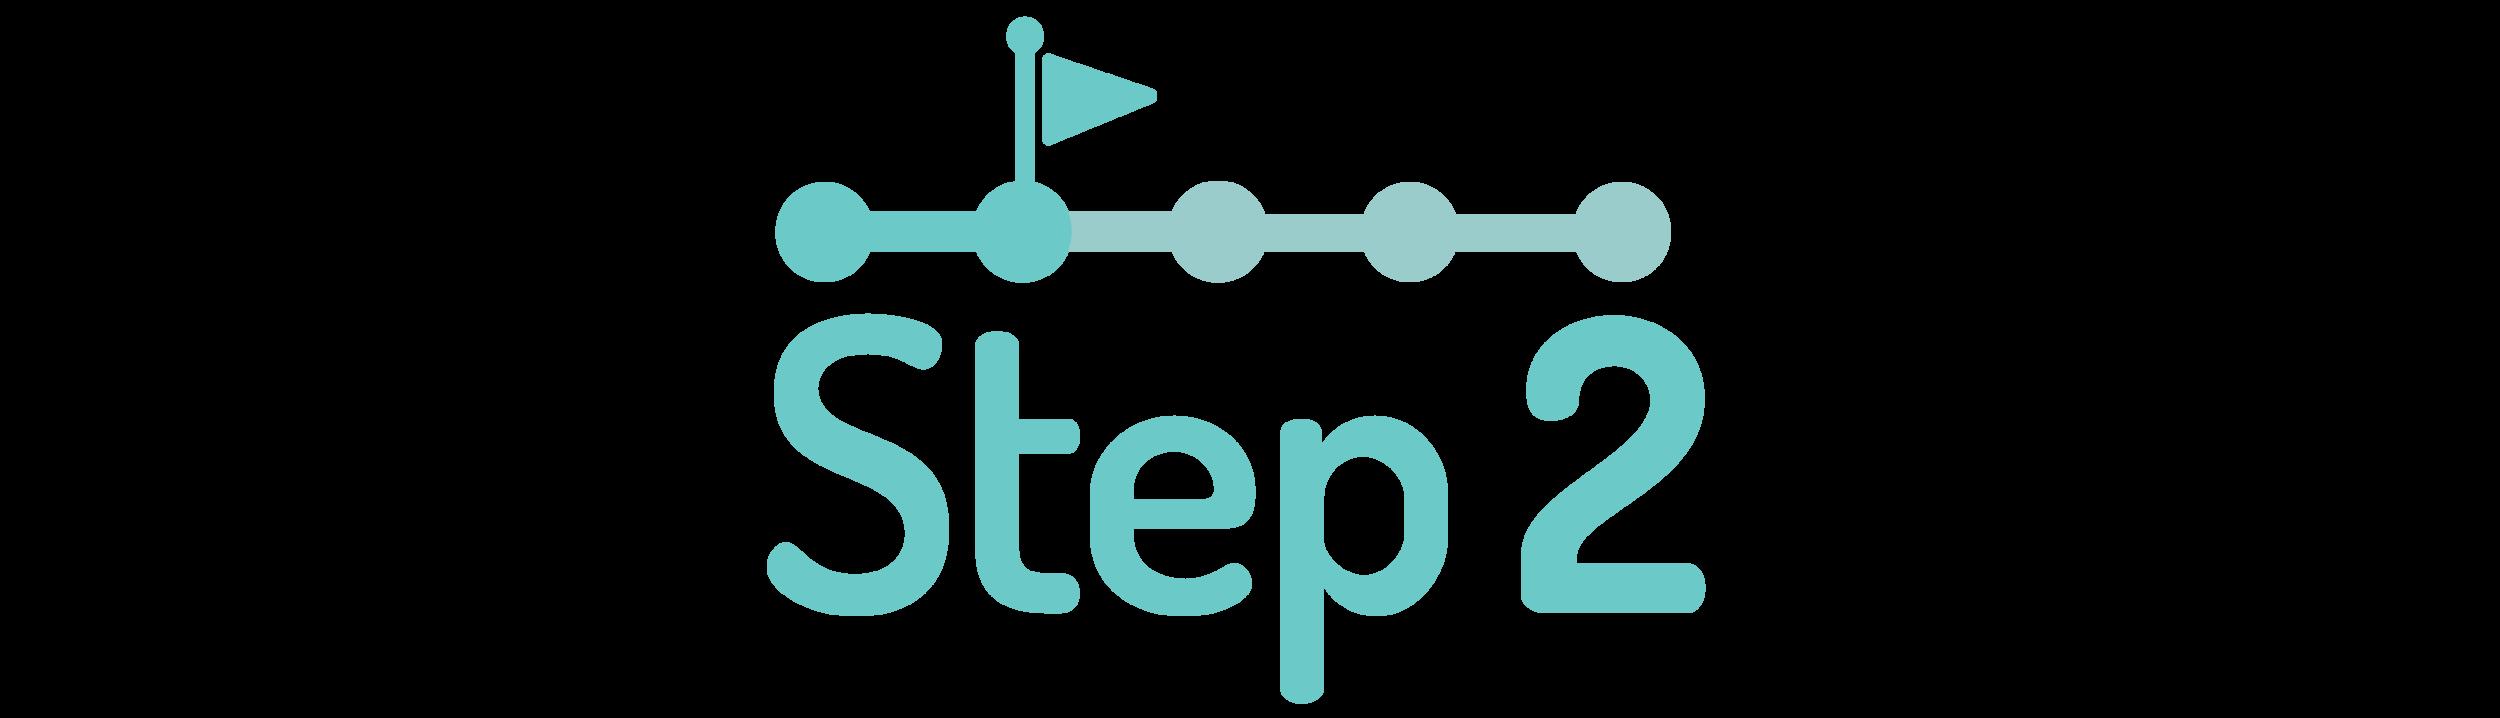 graphic symbolizing step two